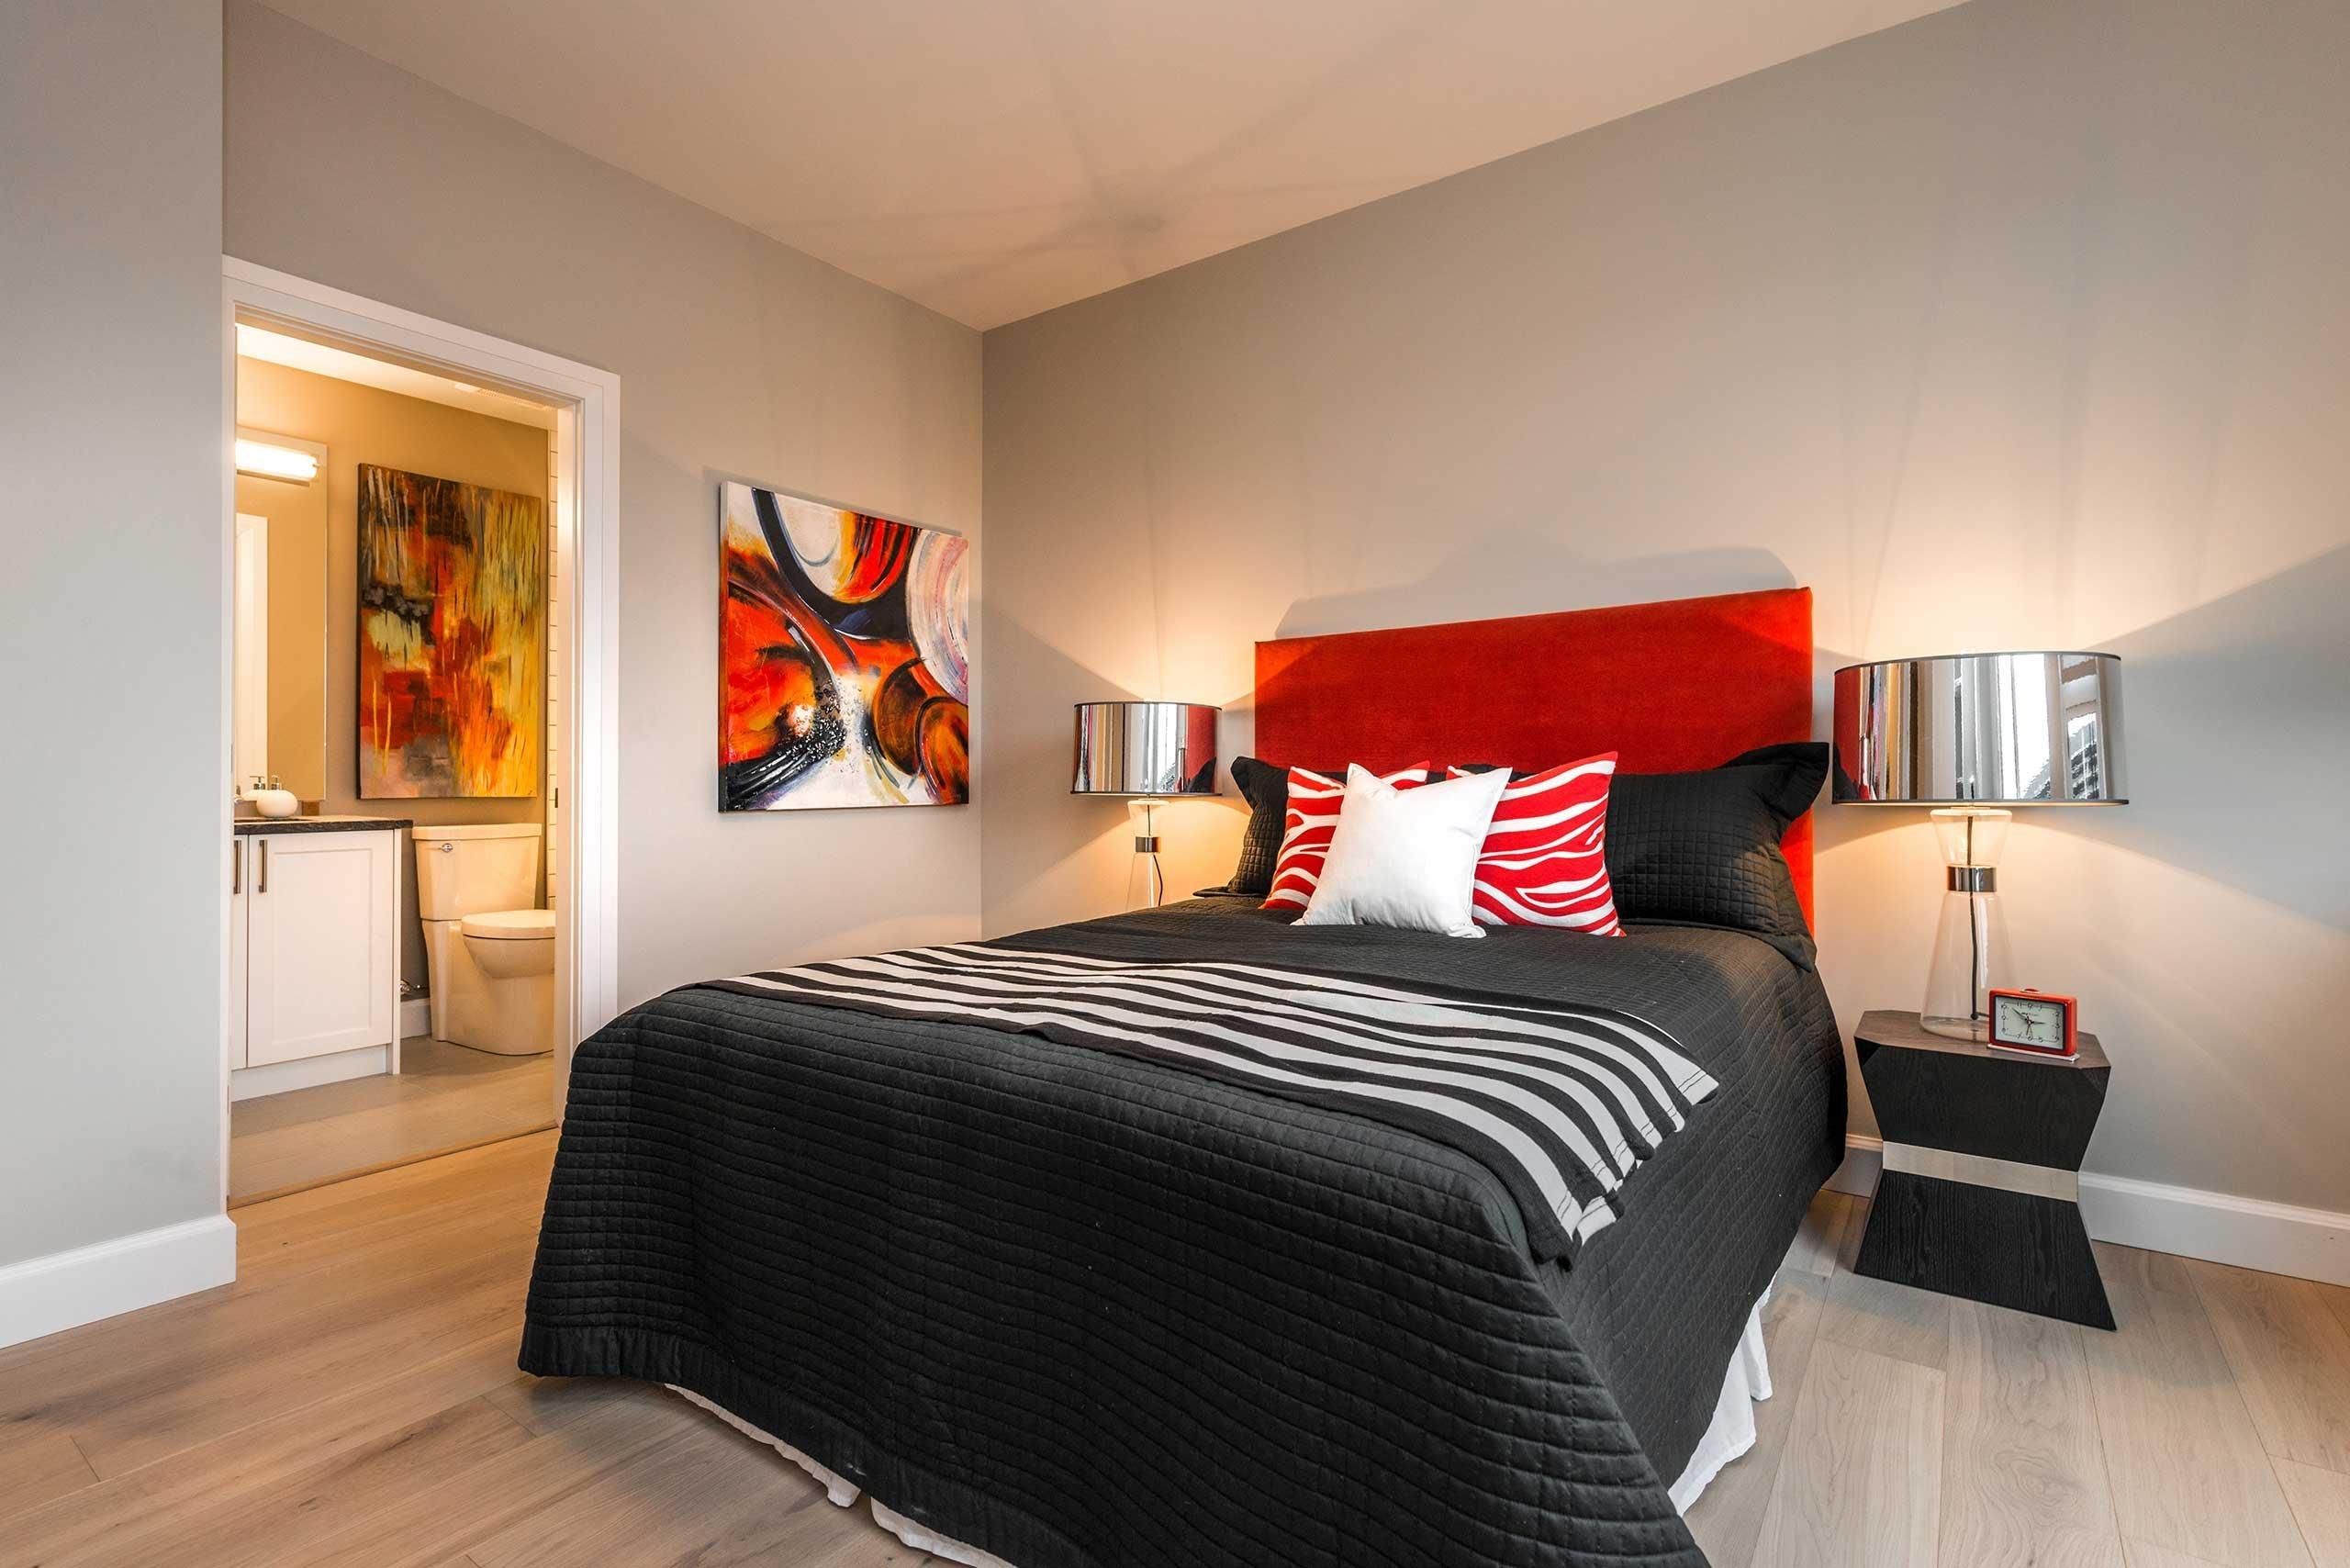 595 Pandora  Master Bedroom!